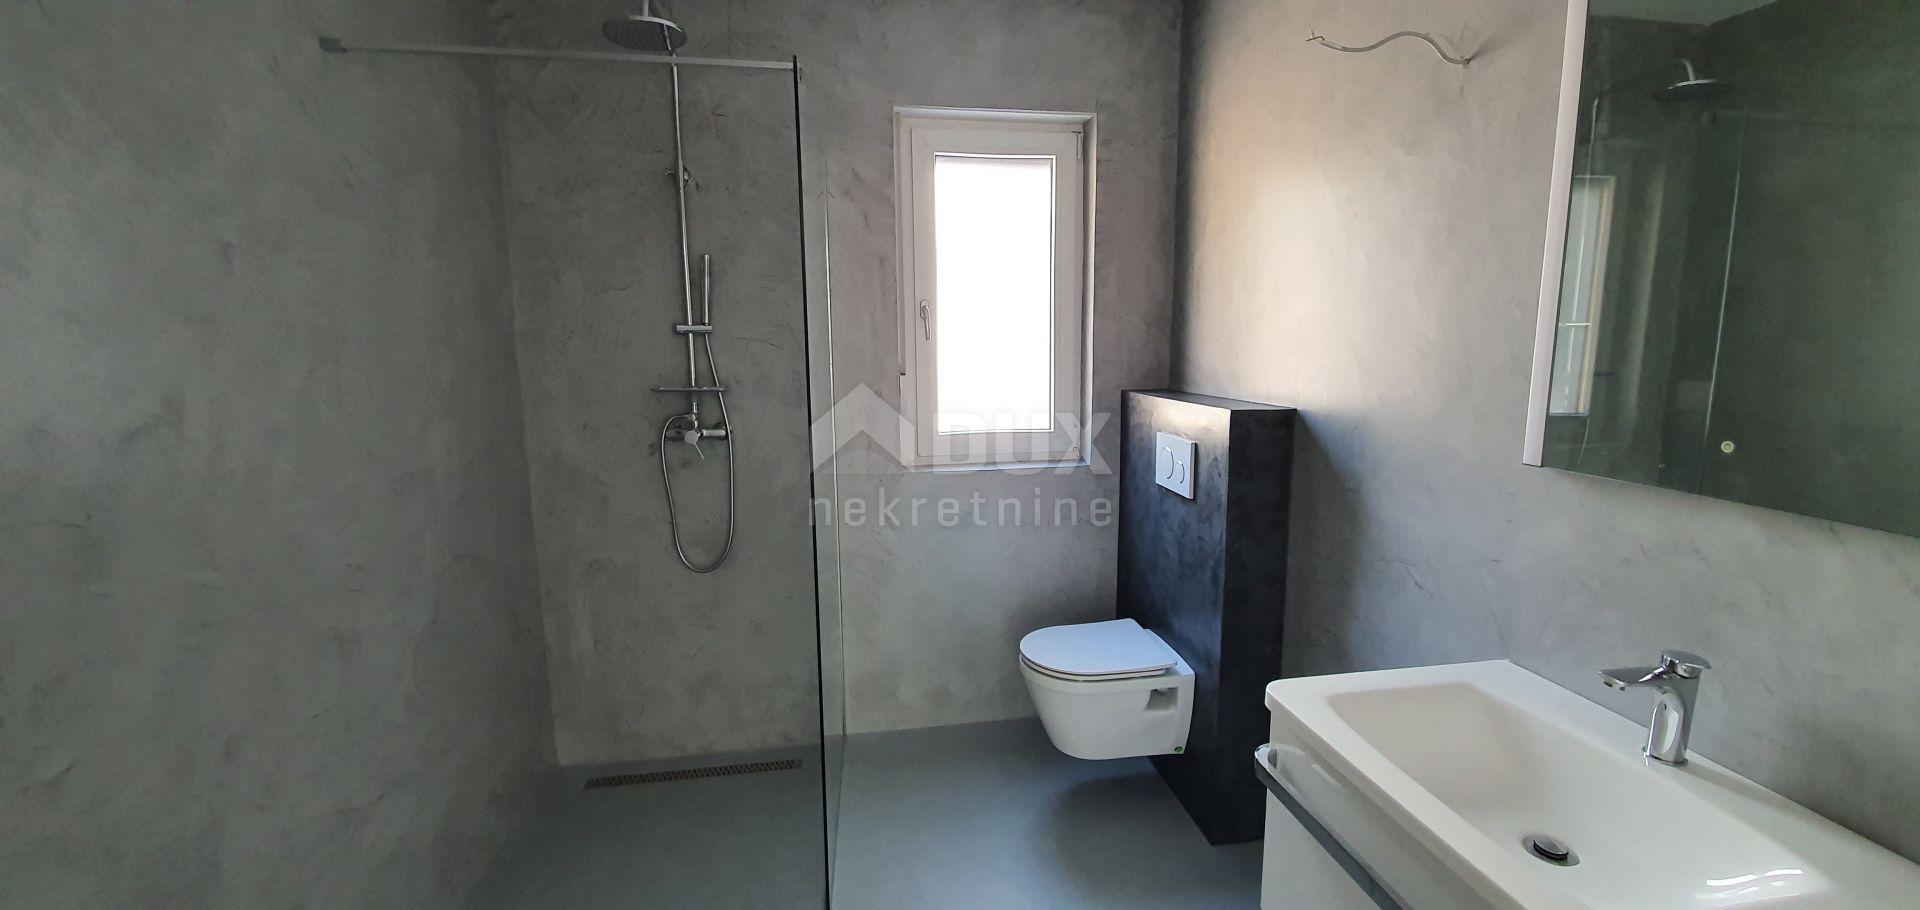 OPATIJA - 3S+DB, 133m², garaža, novogradnja, prodaja